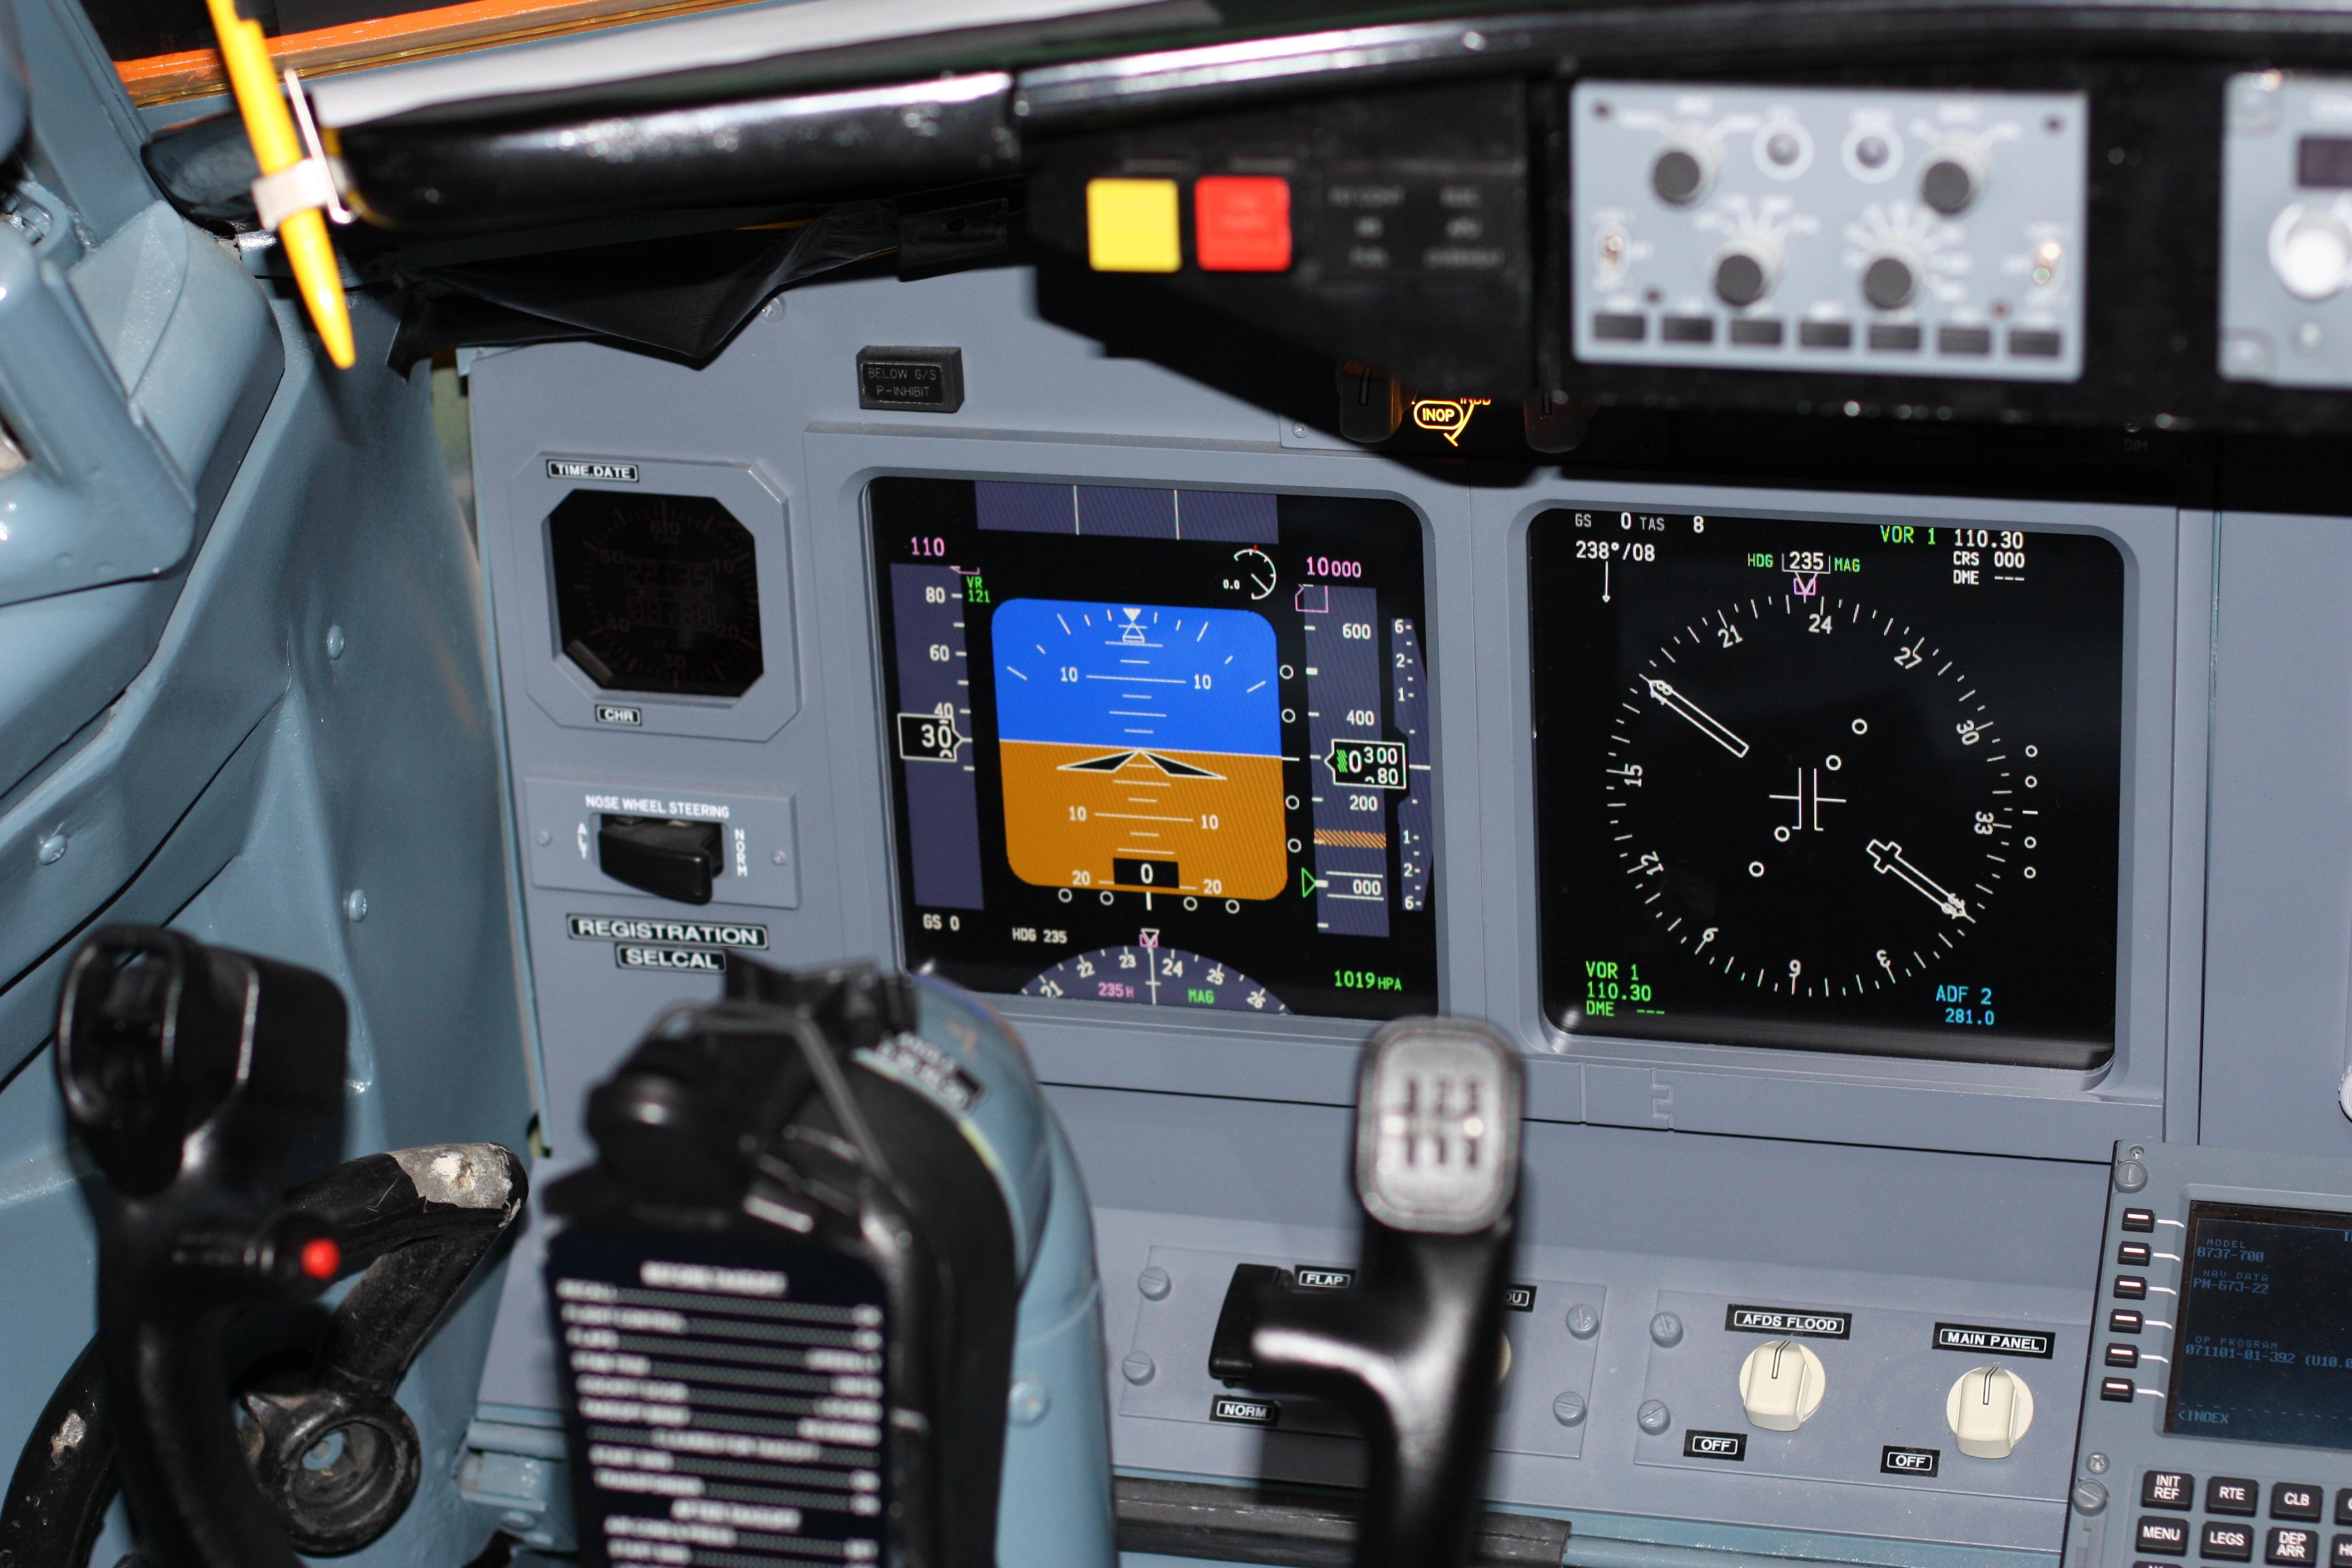 File:Cockpit of Boeing 737 700 Flight Simulator in BerlinIMG 0135